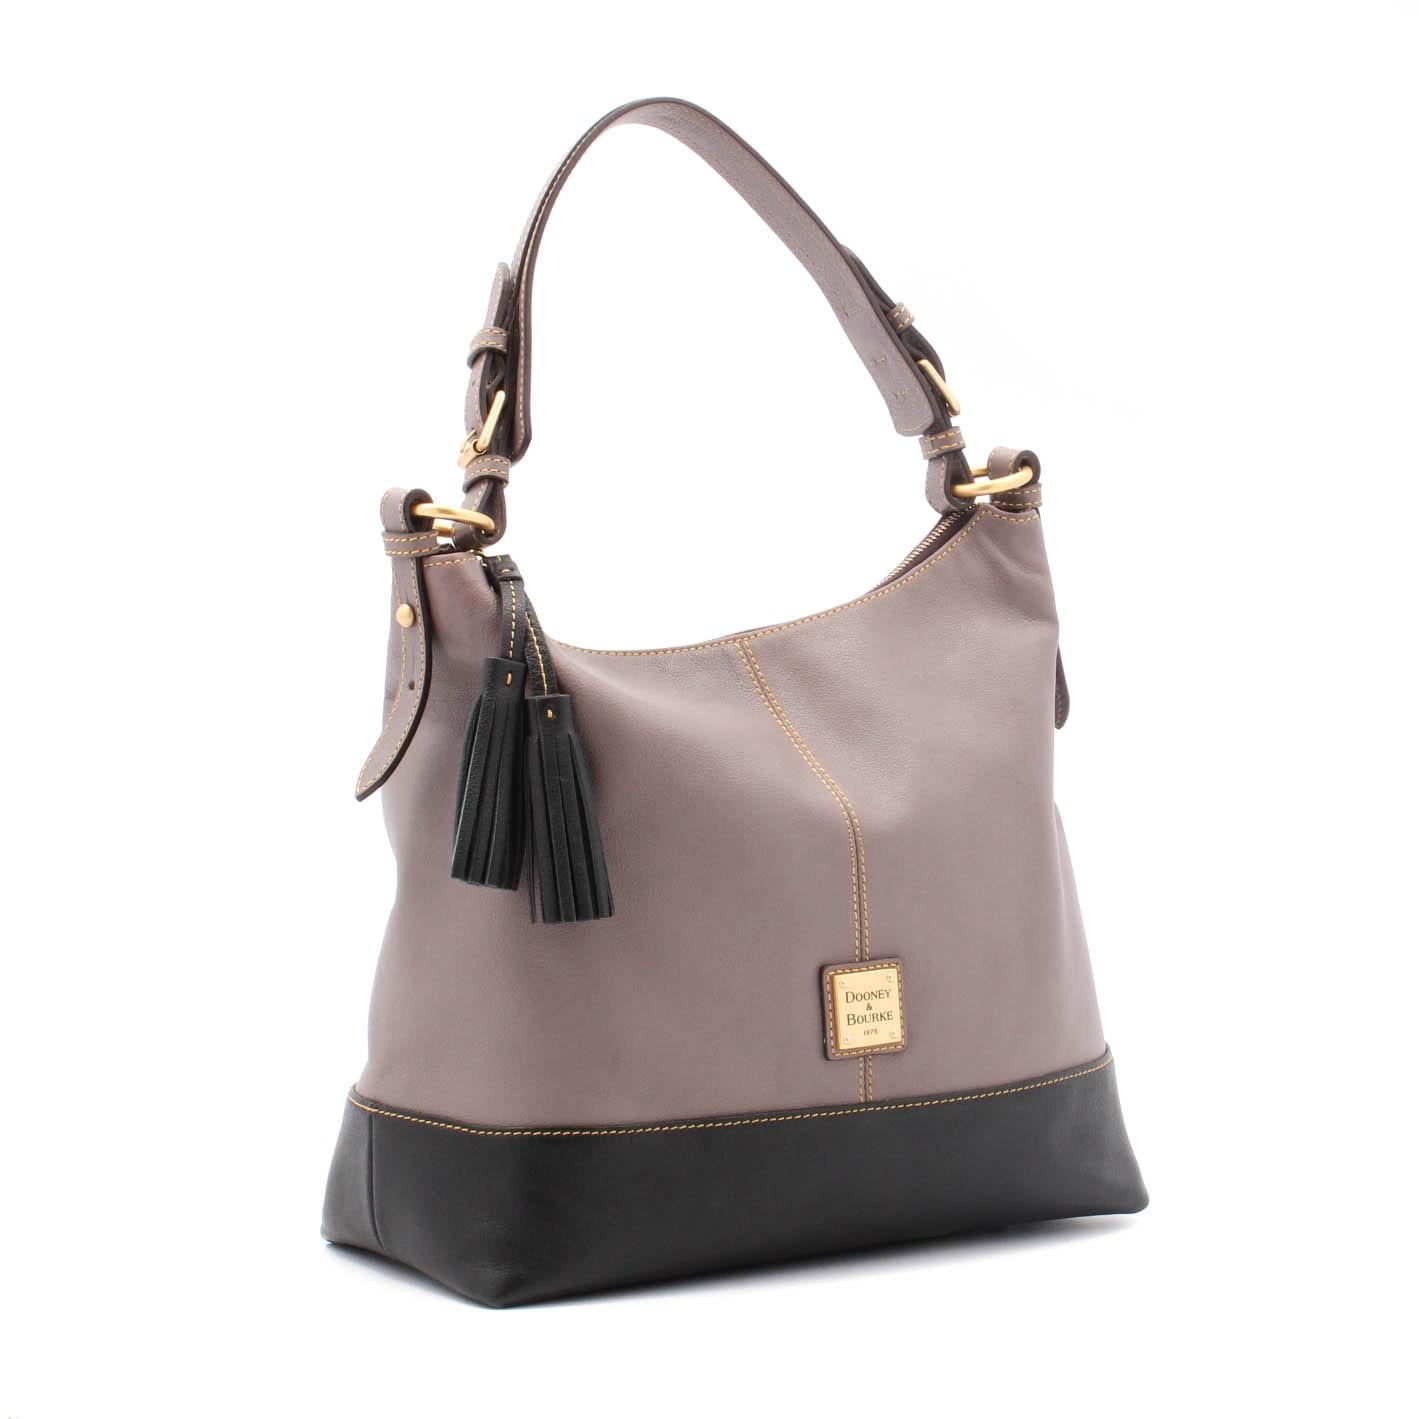 Dooney & Bourke Taupe and Black Leather Bucket Handbag